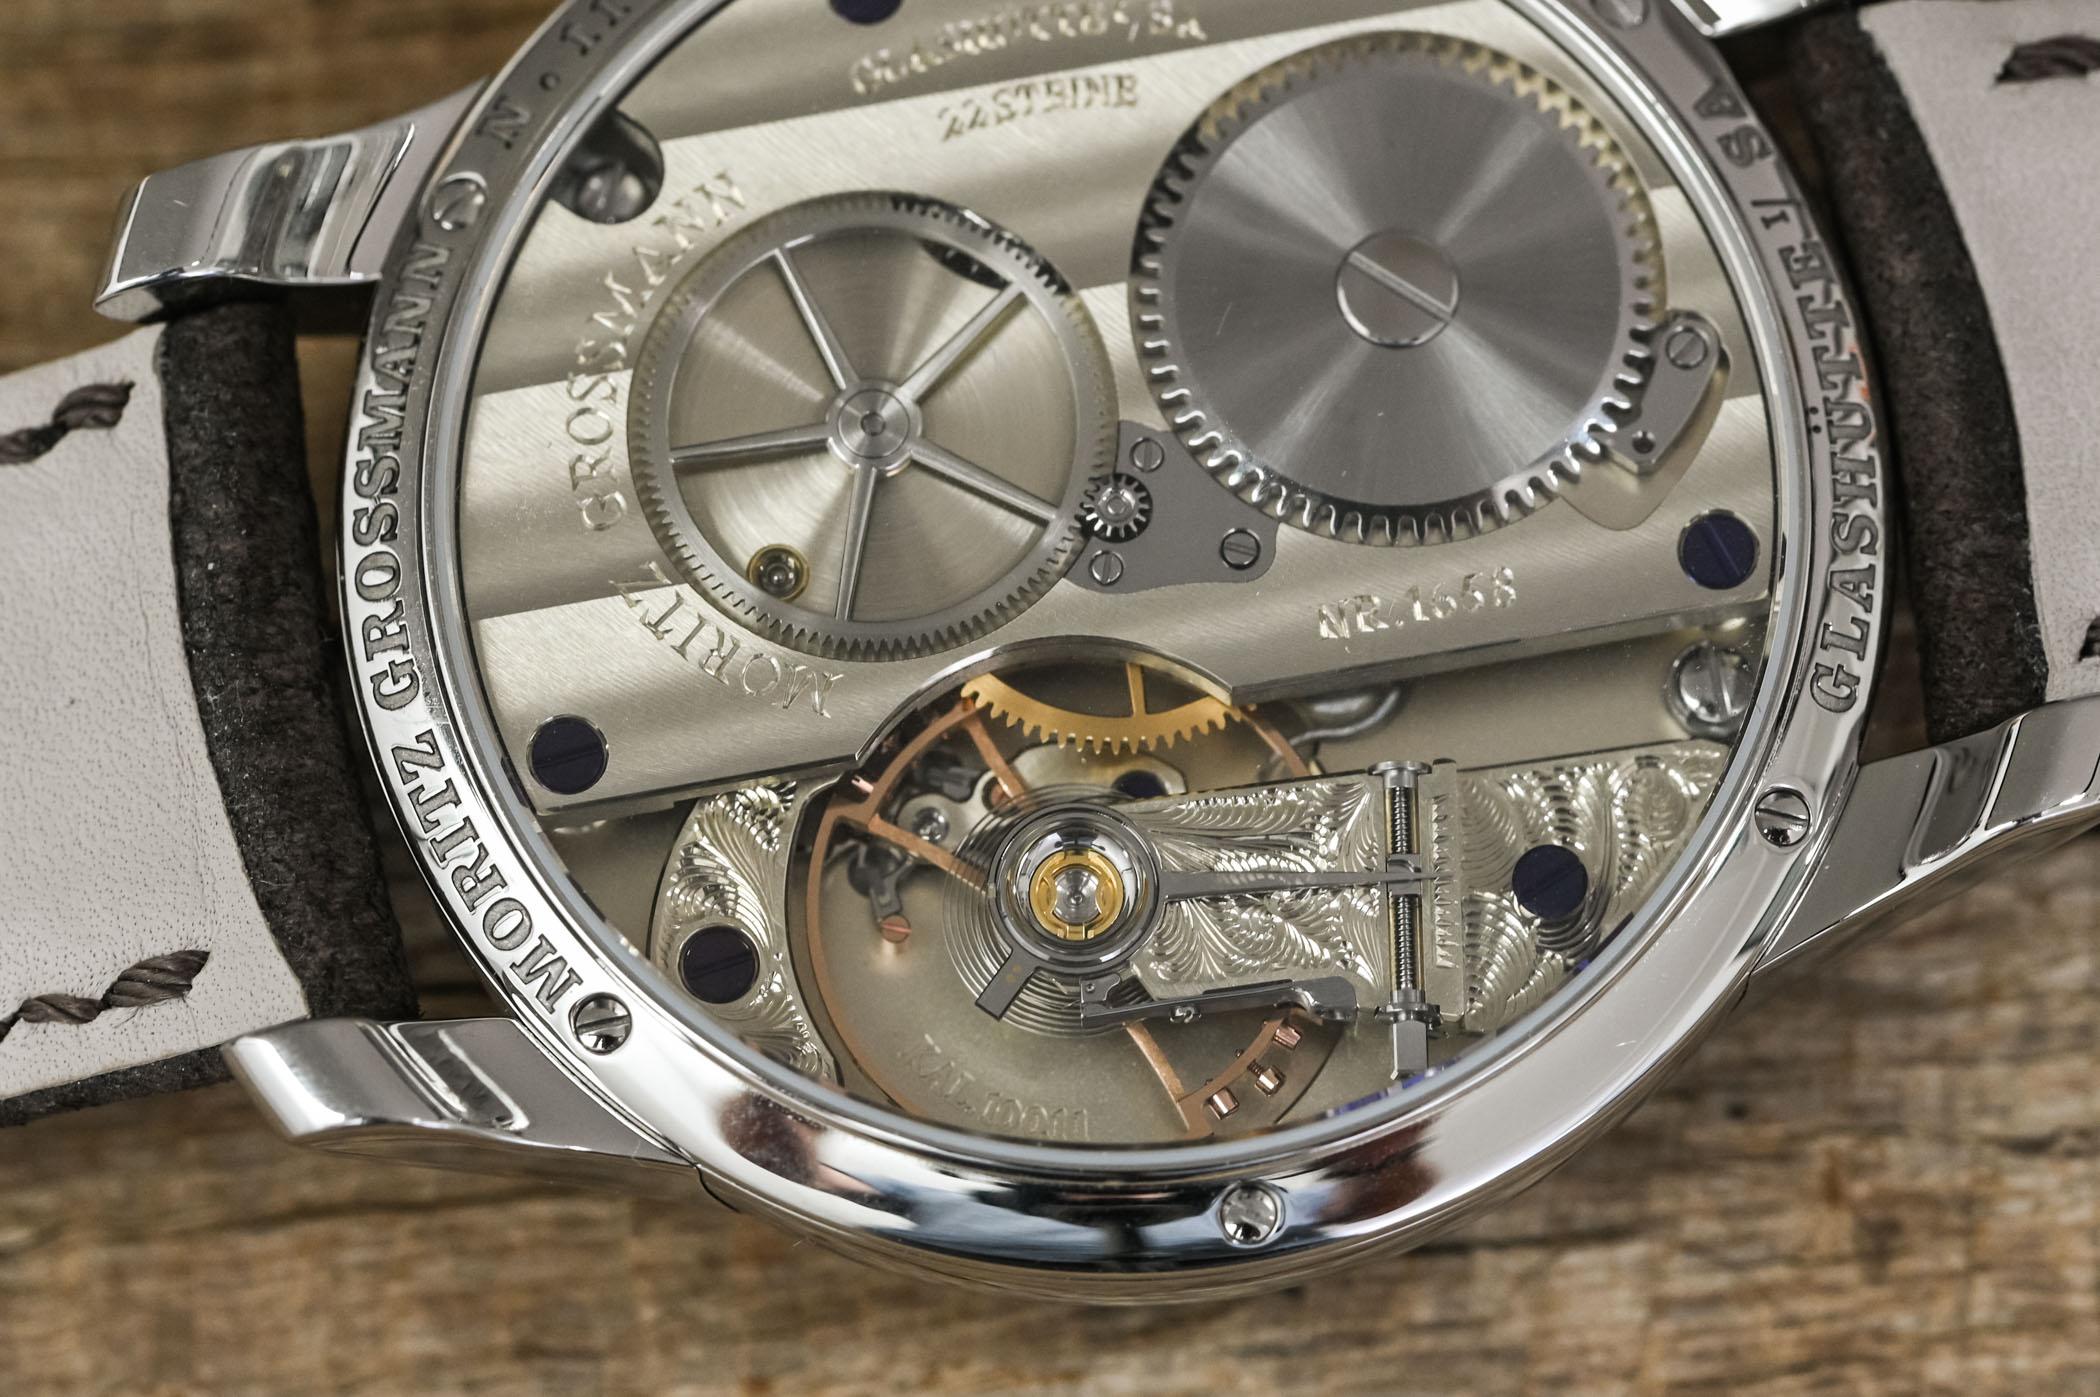 Moritz Grossmann Central Second stainless steel blue dial